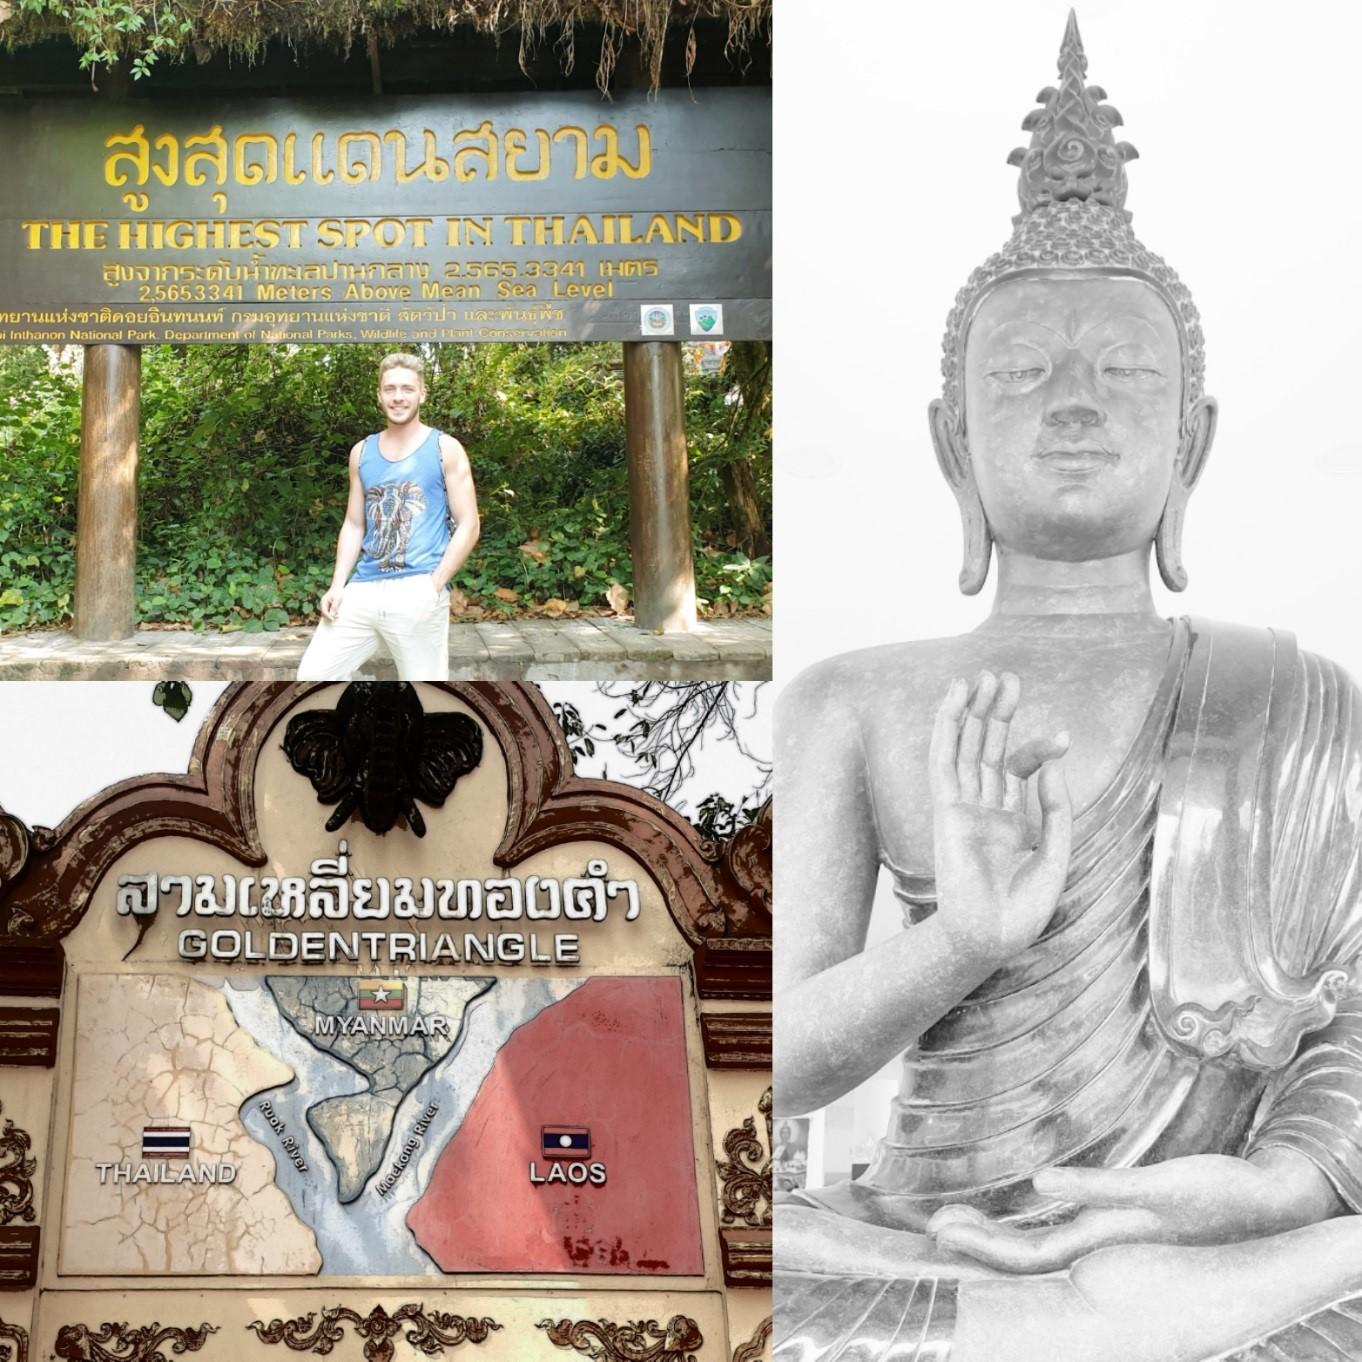 Fran last day in Thailand blog